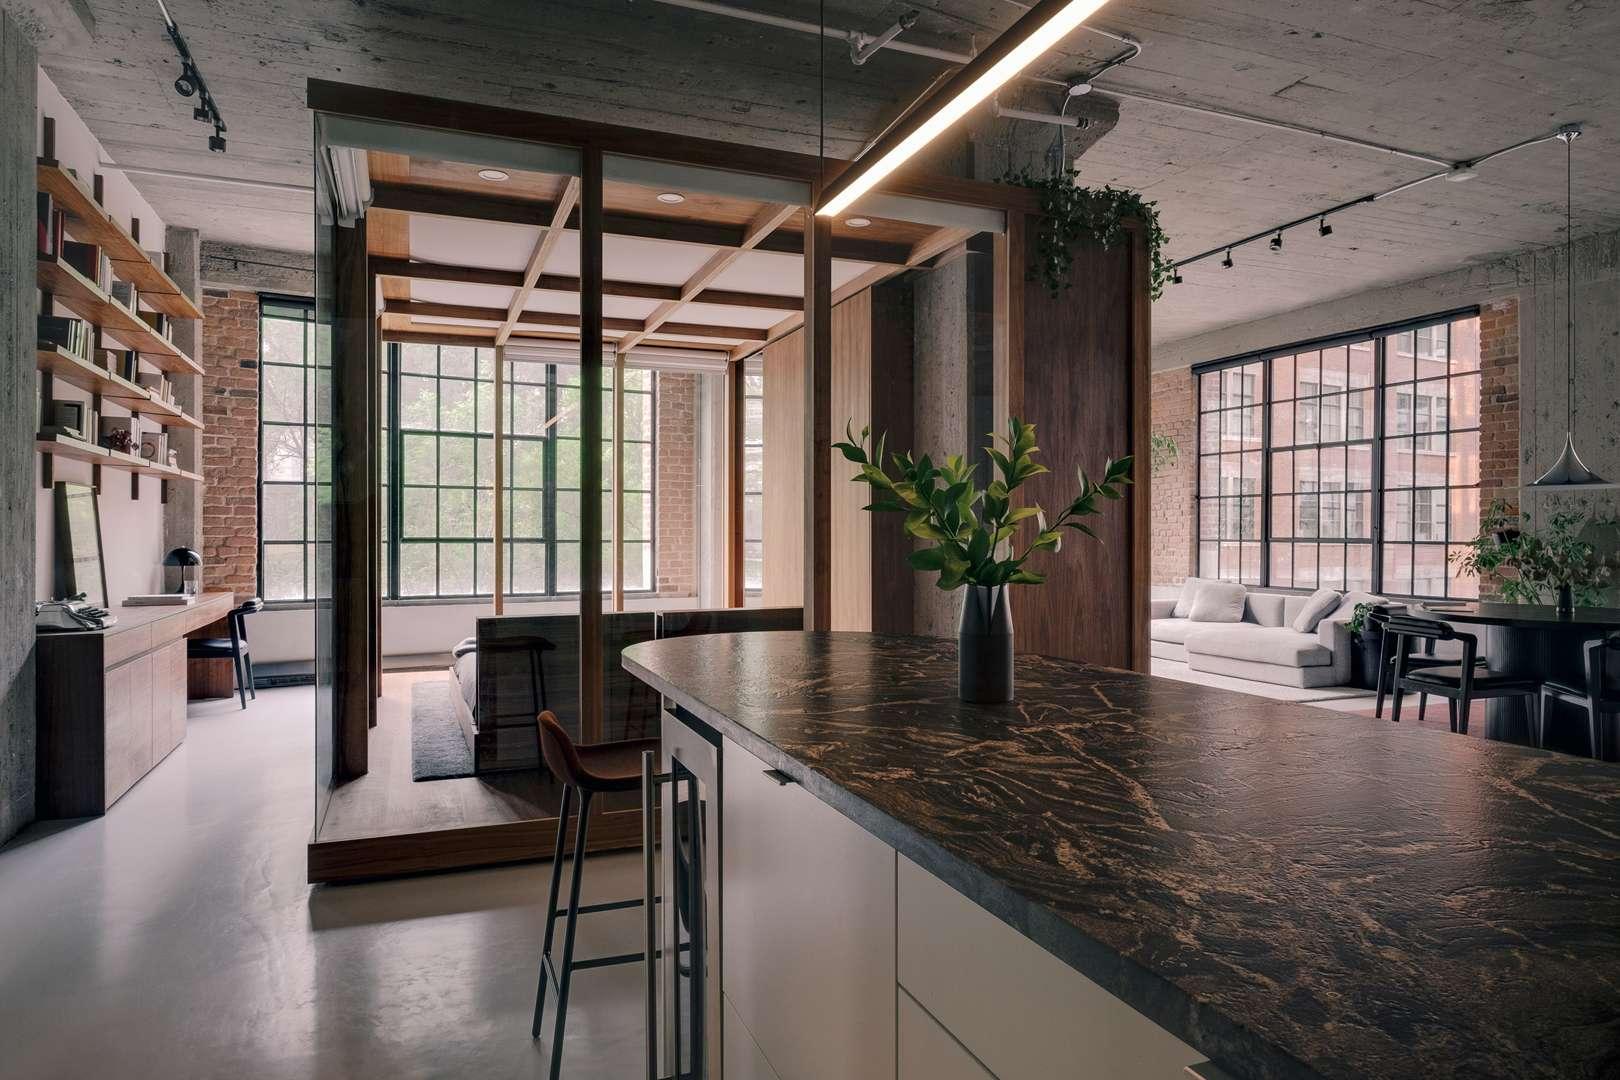 montreal-loft-renovation-by-future-simple-studio-interiors-canada_dezeen_2364_col_14-1